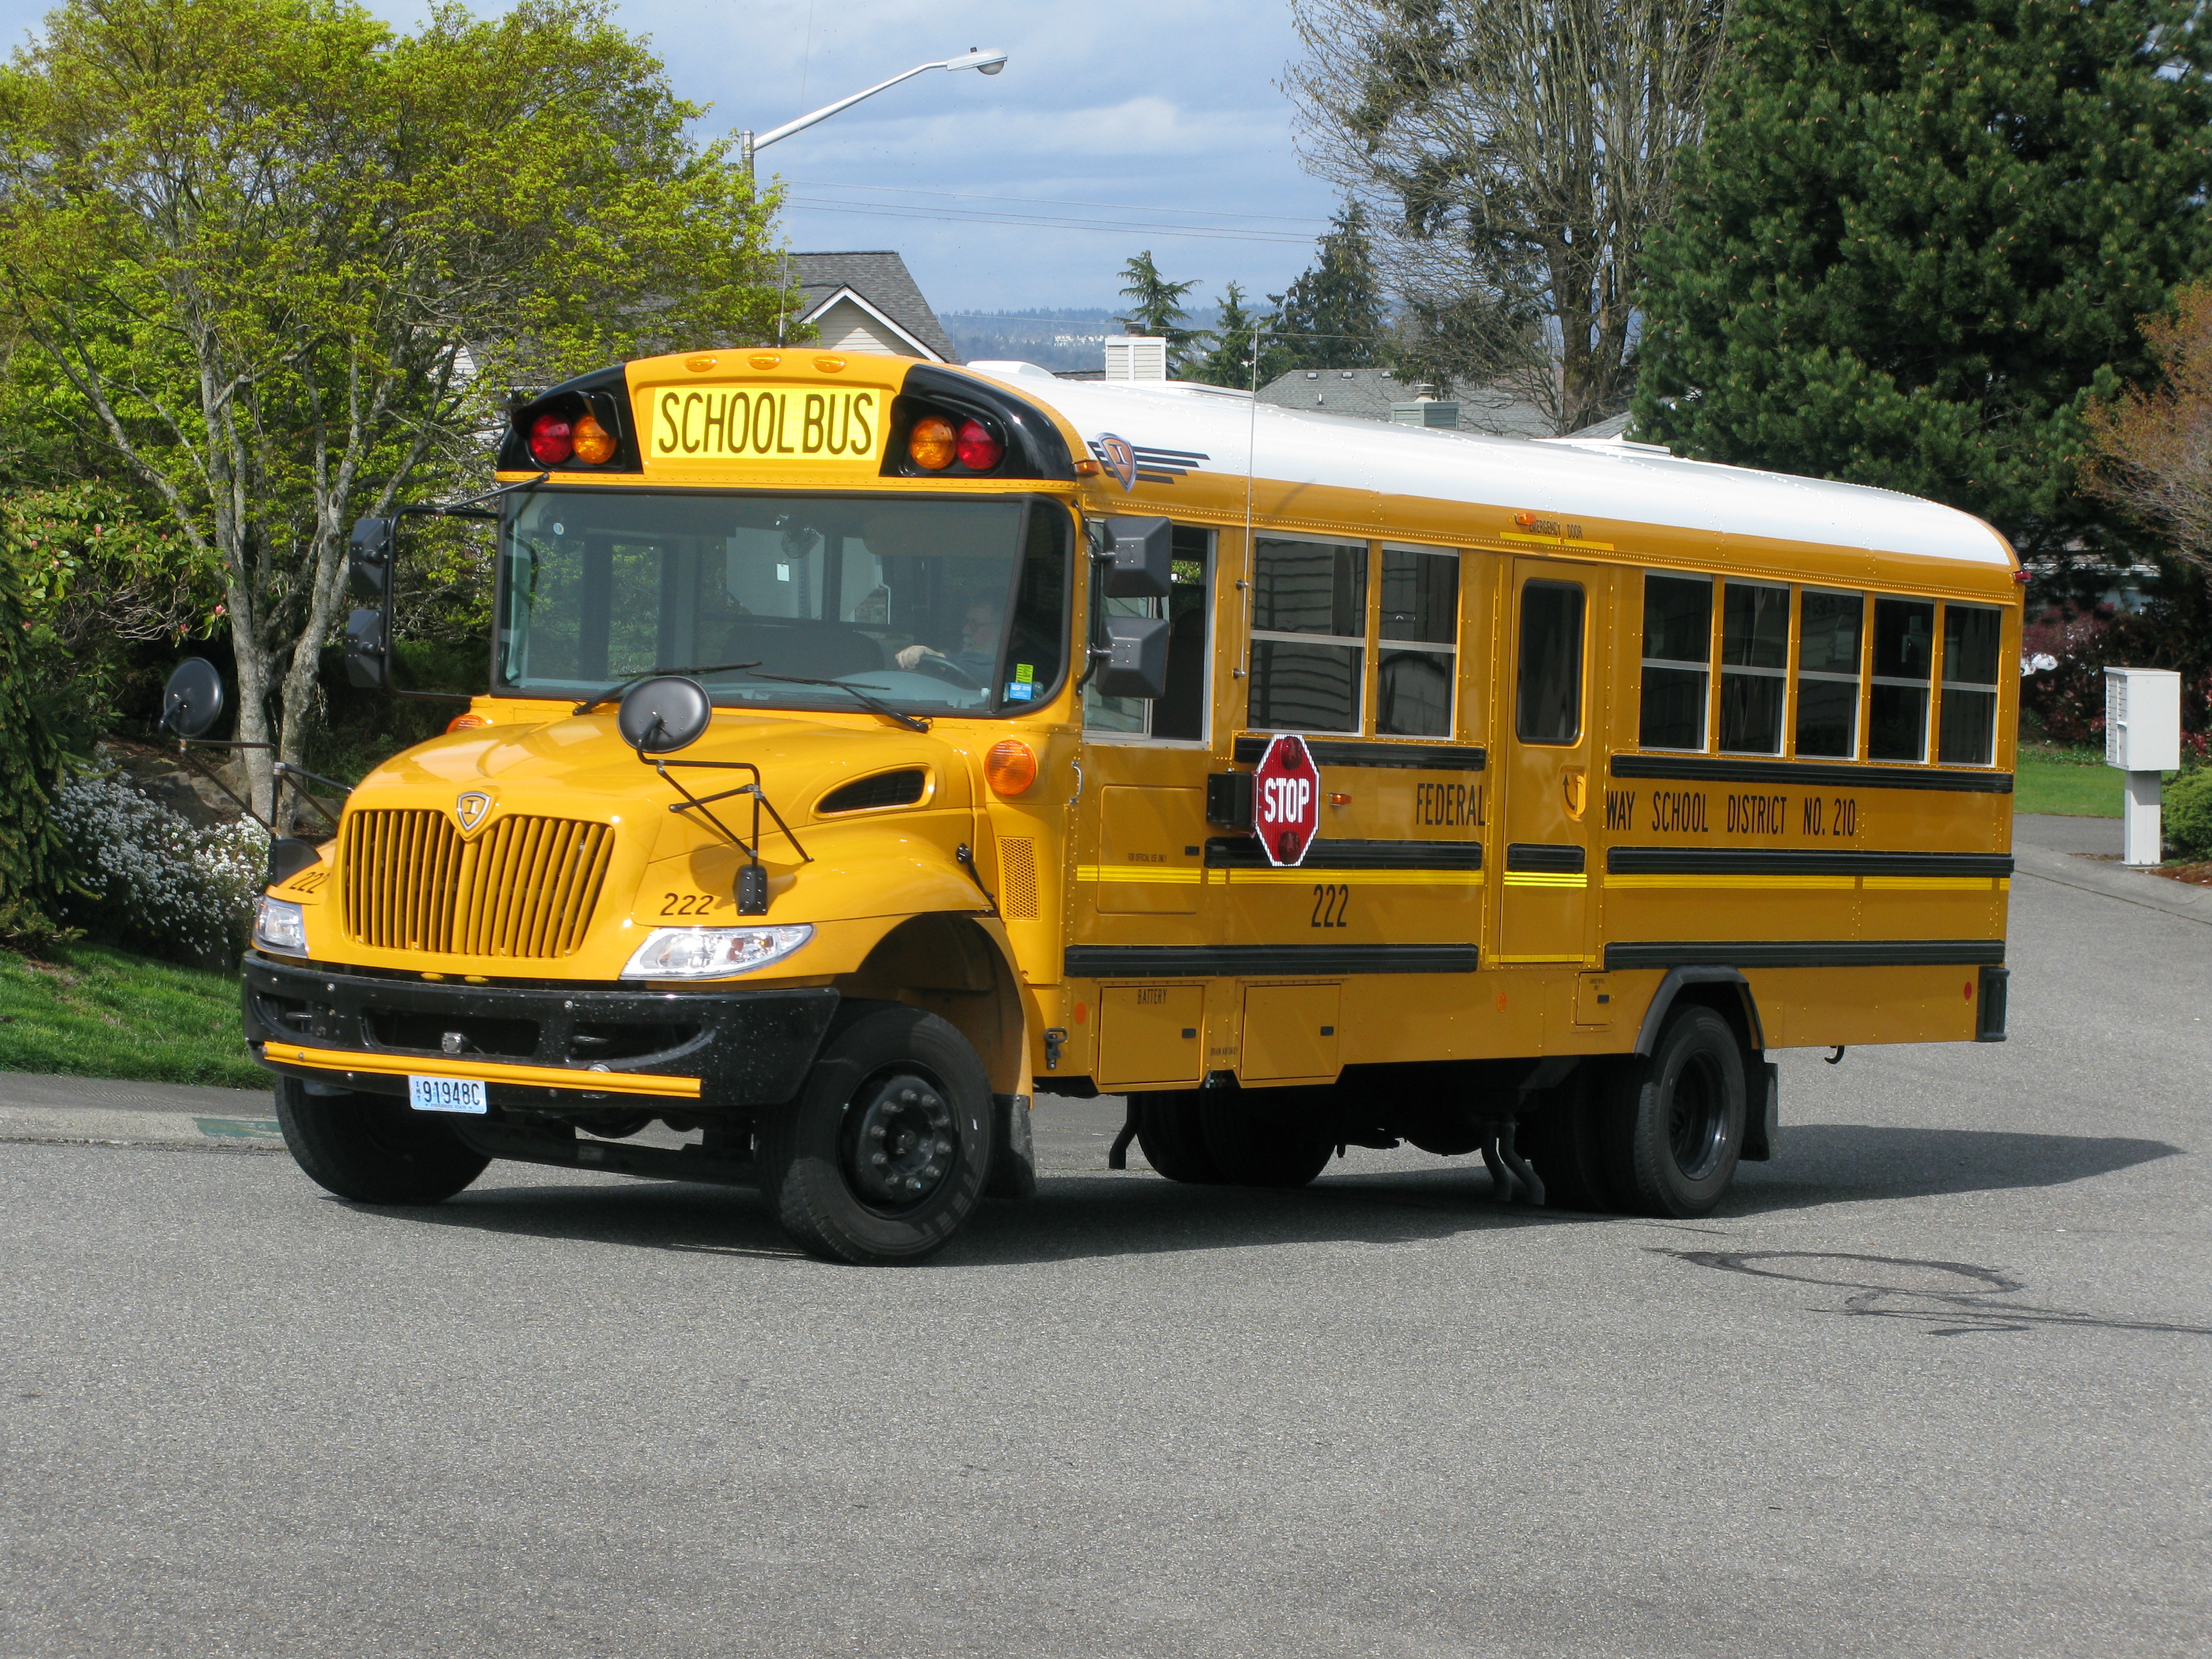 FileIC BE school busjpg   Wikipedia the encyclopedia 4000x3000